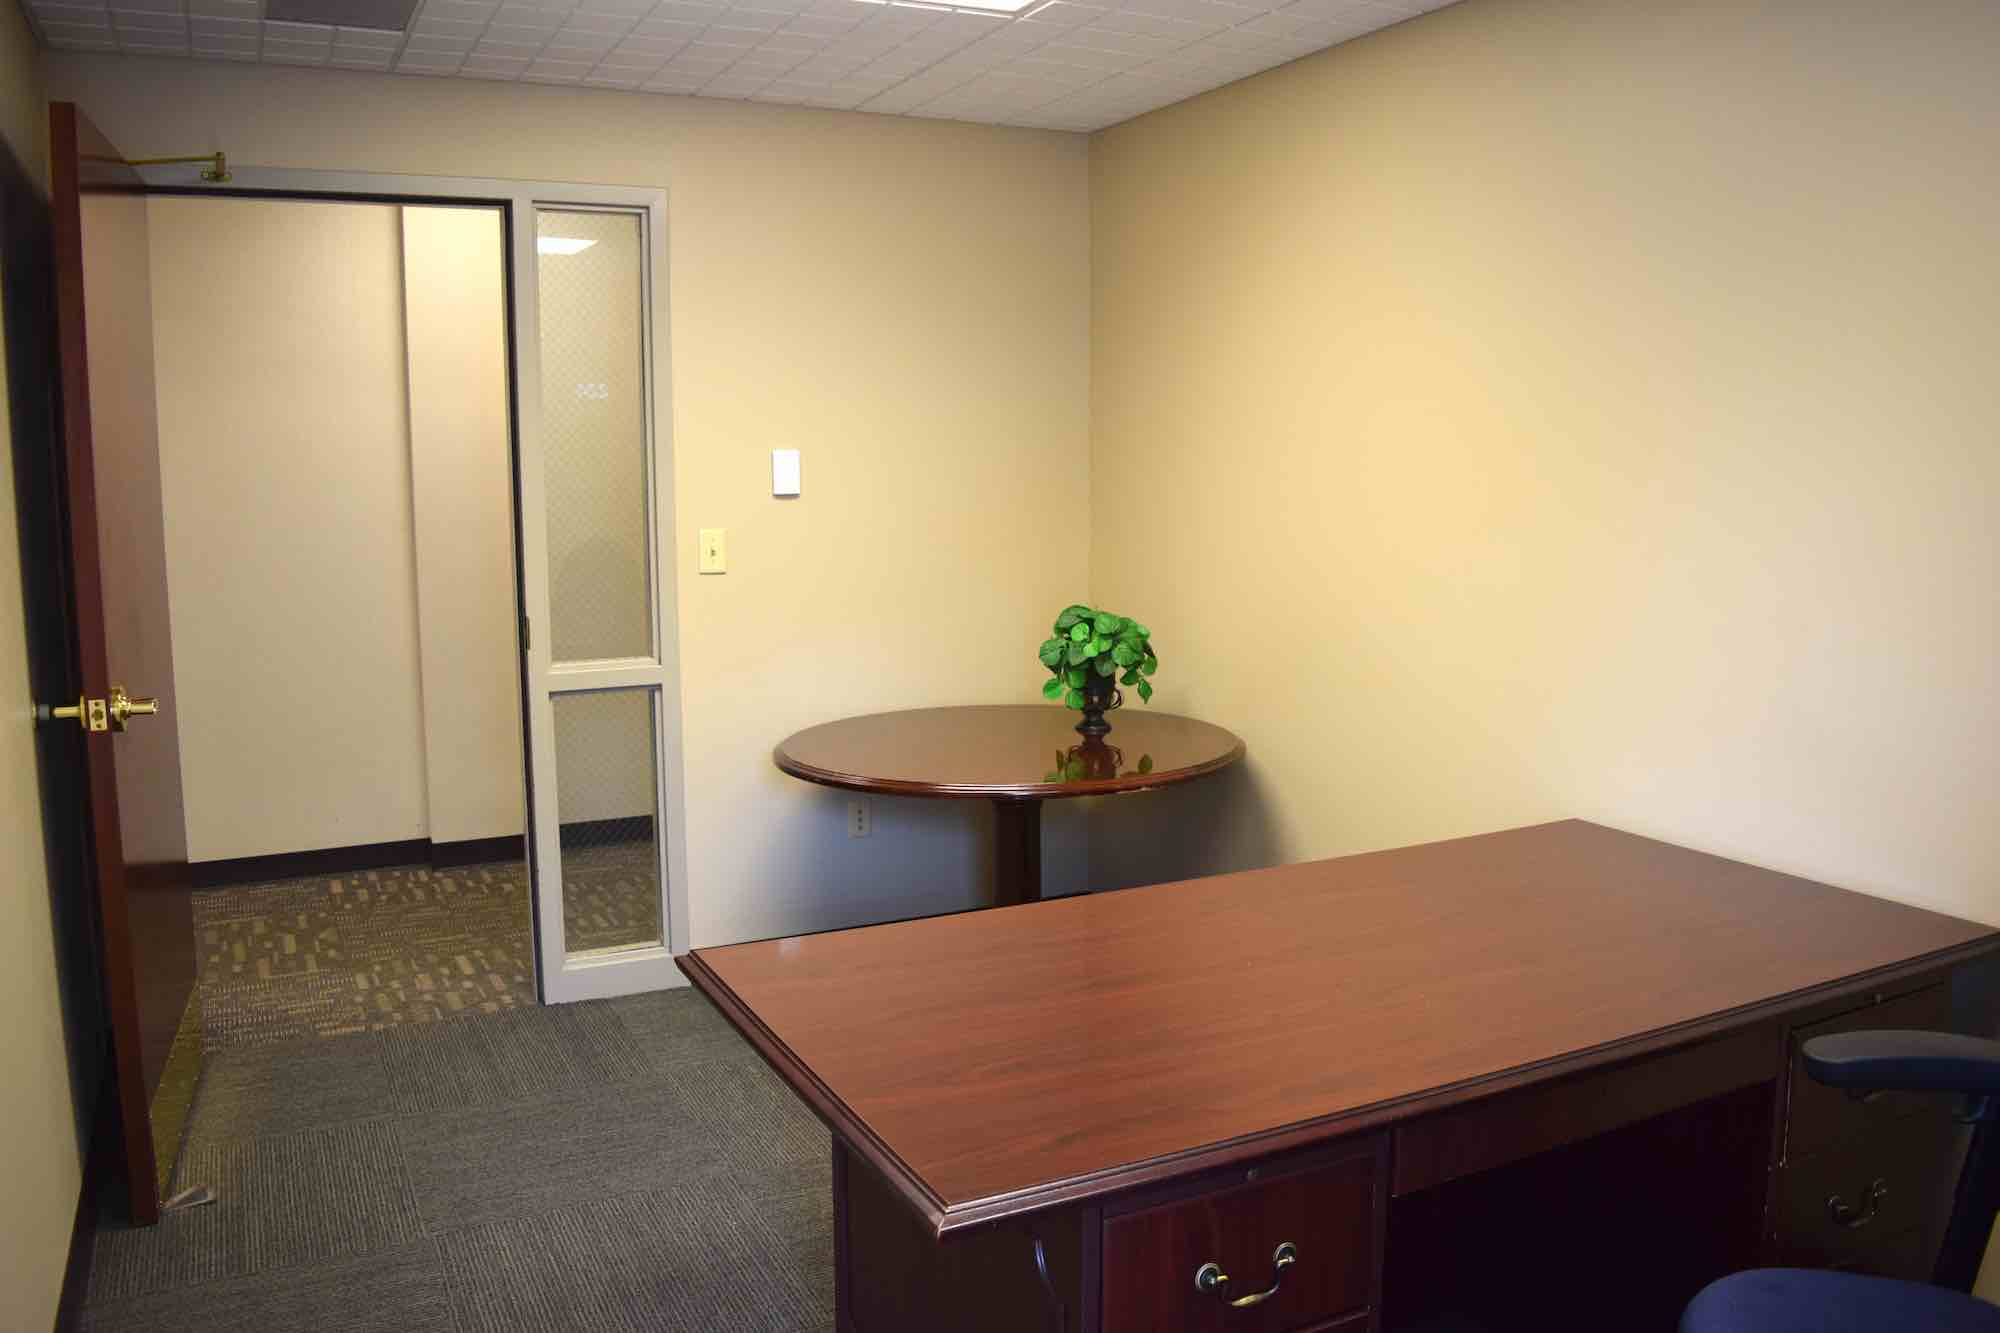 224 Office